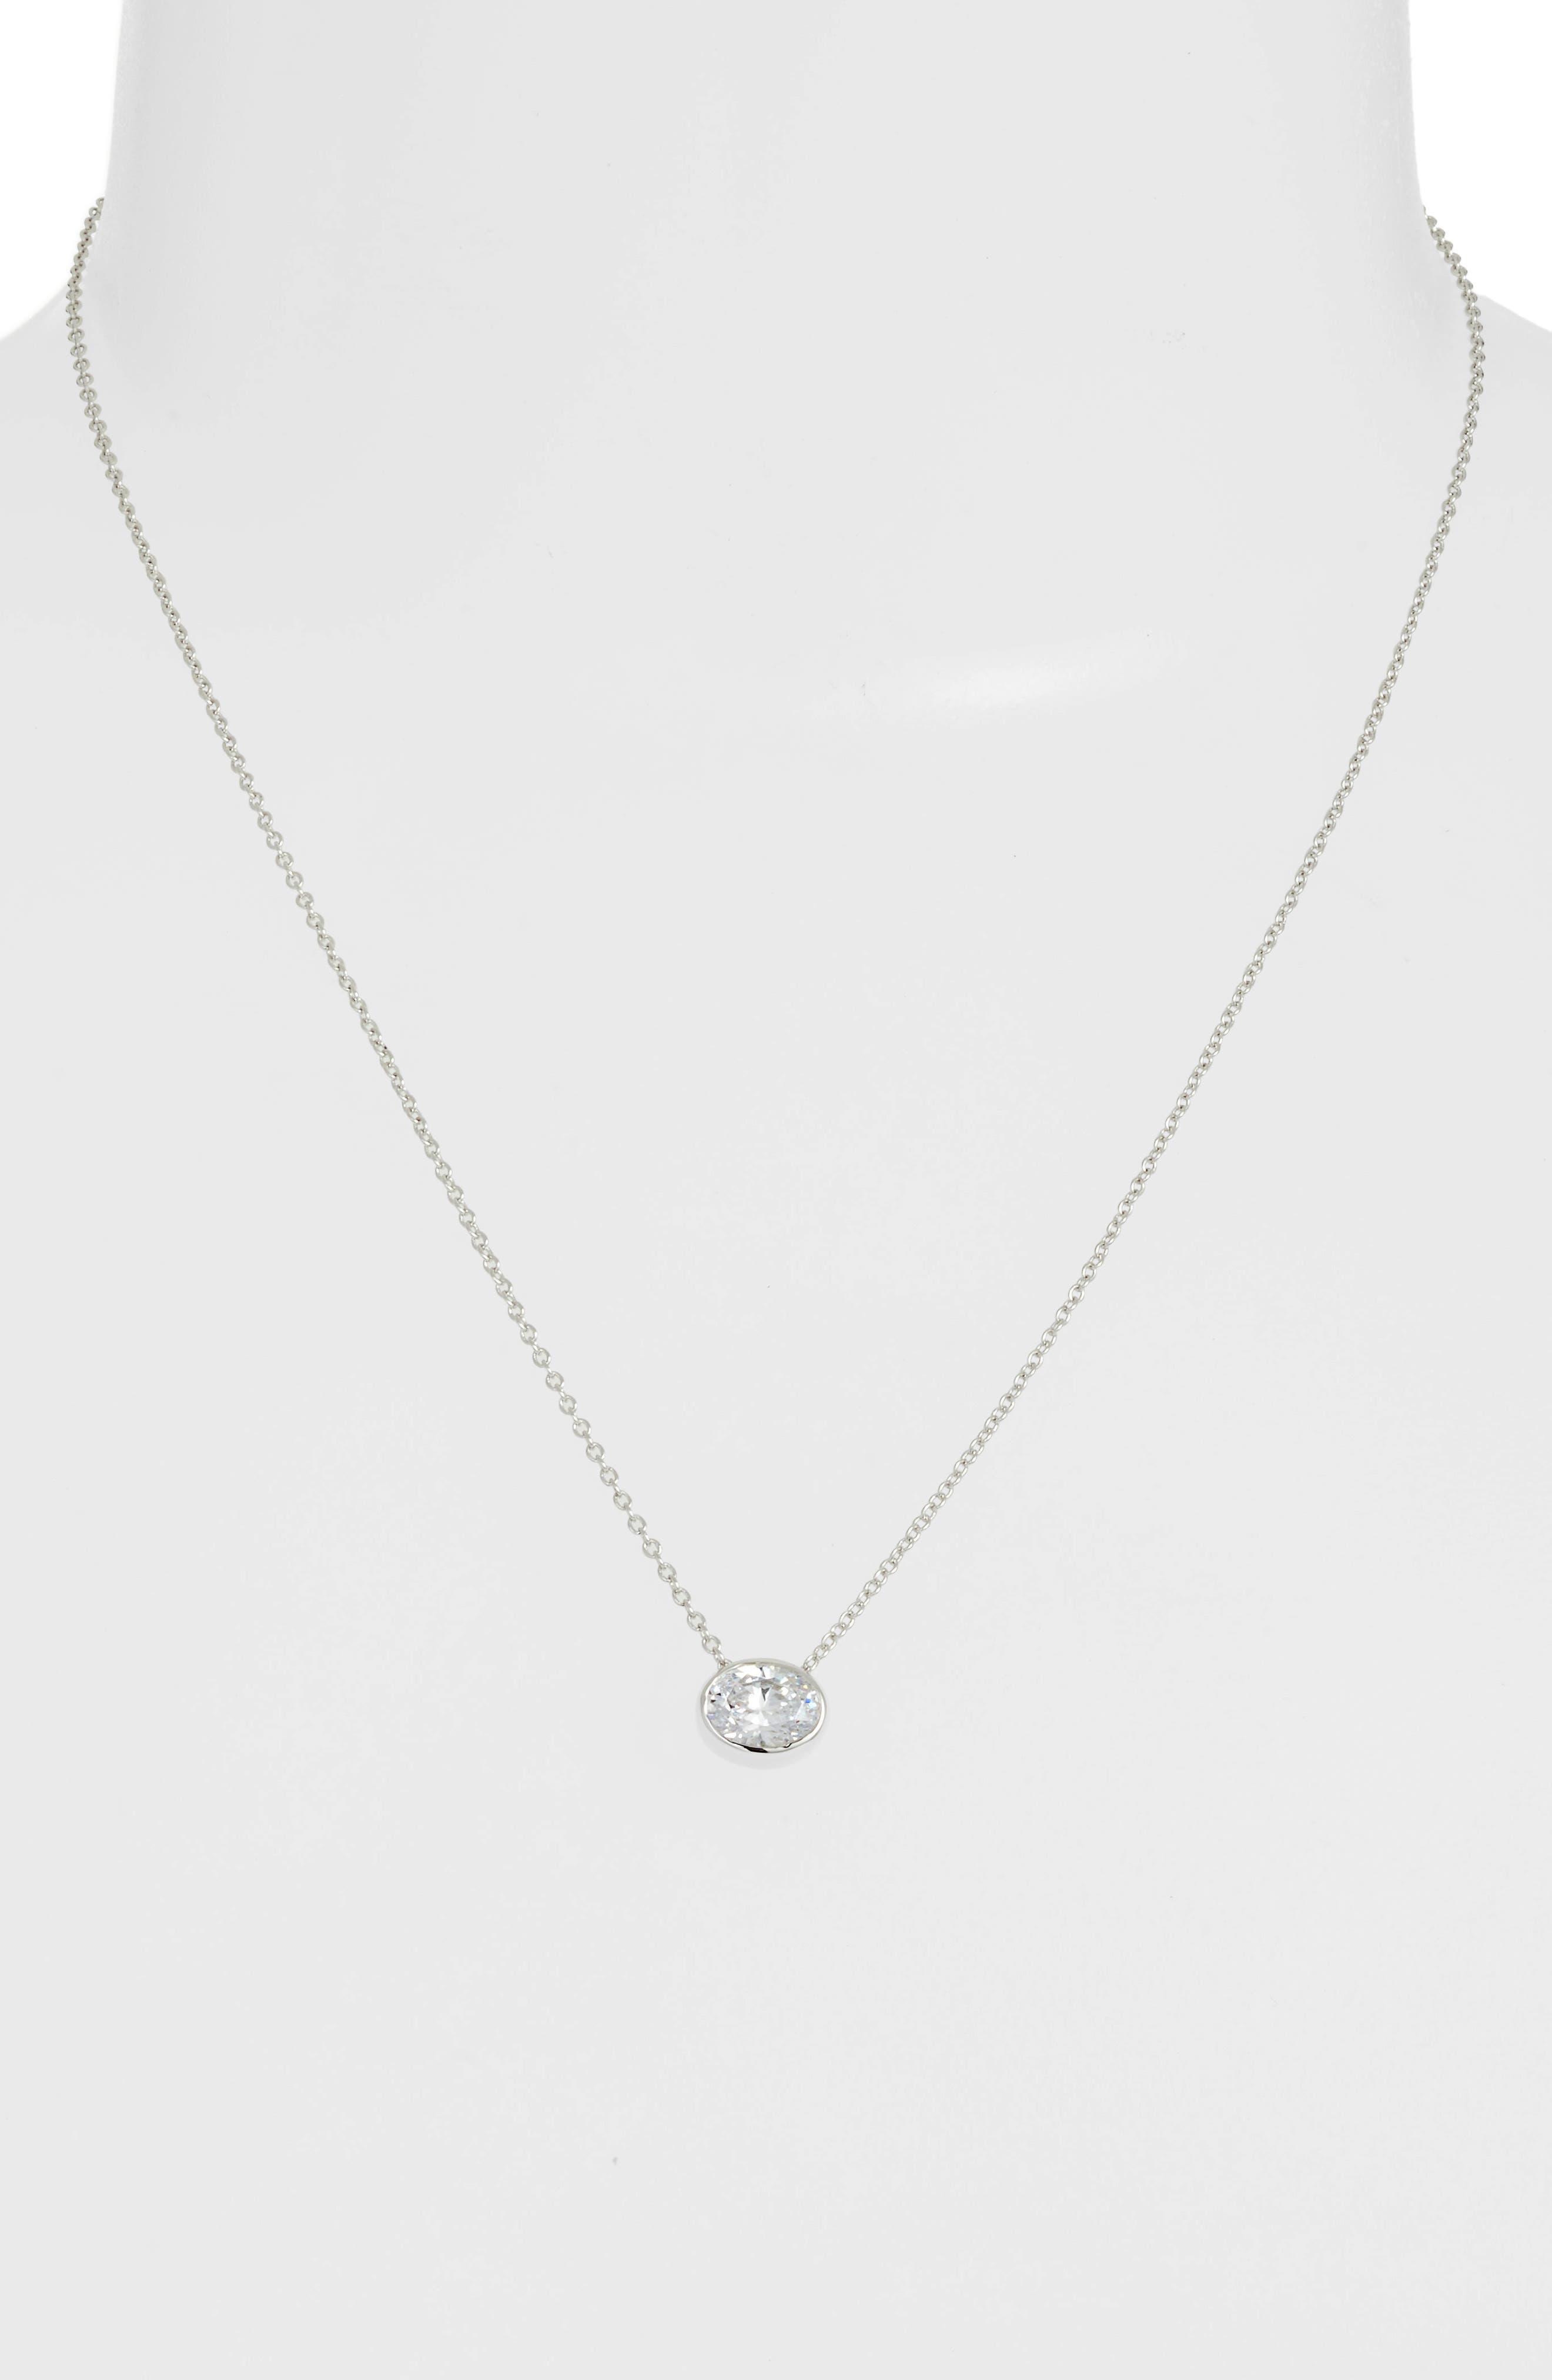 Bezel-Set Cushion-Cut Choker Necklace,                             Alternate thumbnail 2, color,                             SILVER/ CLEAR